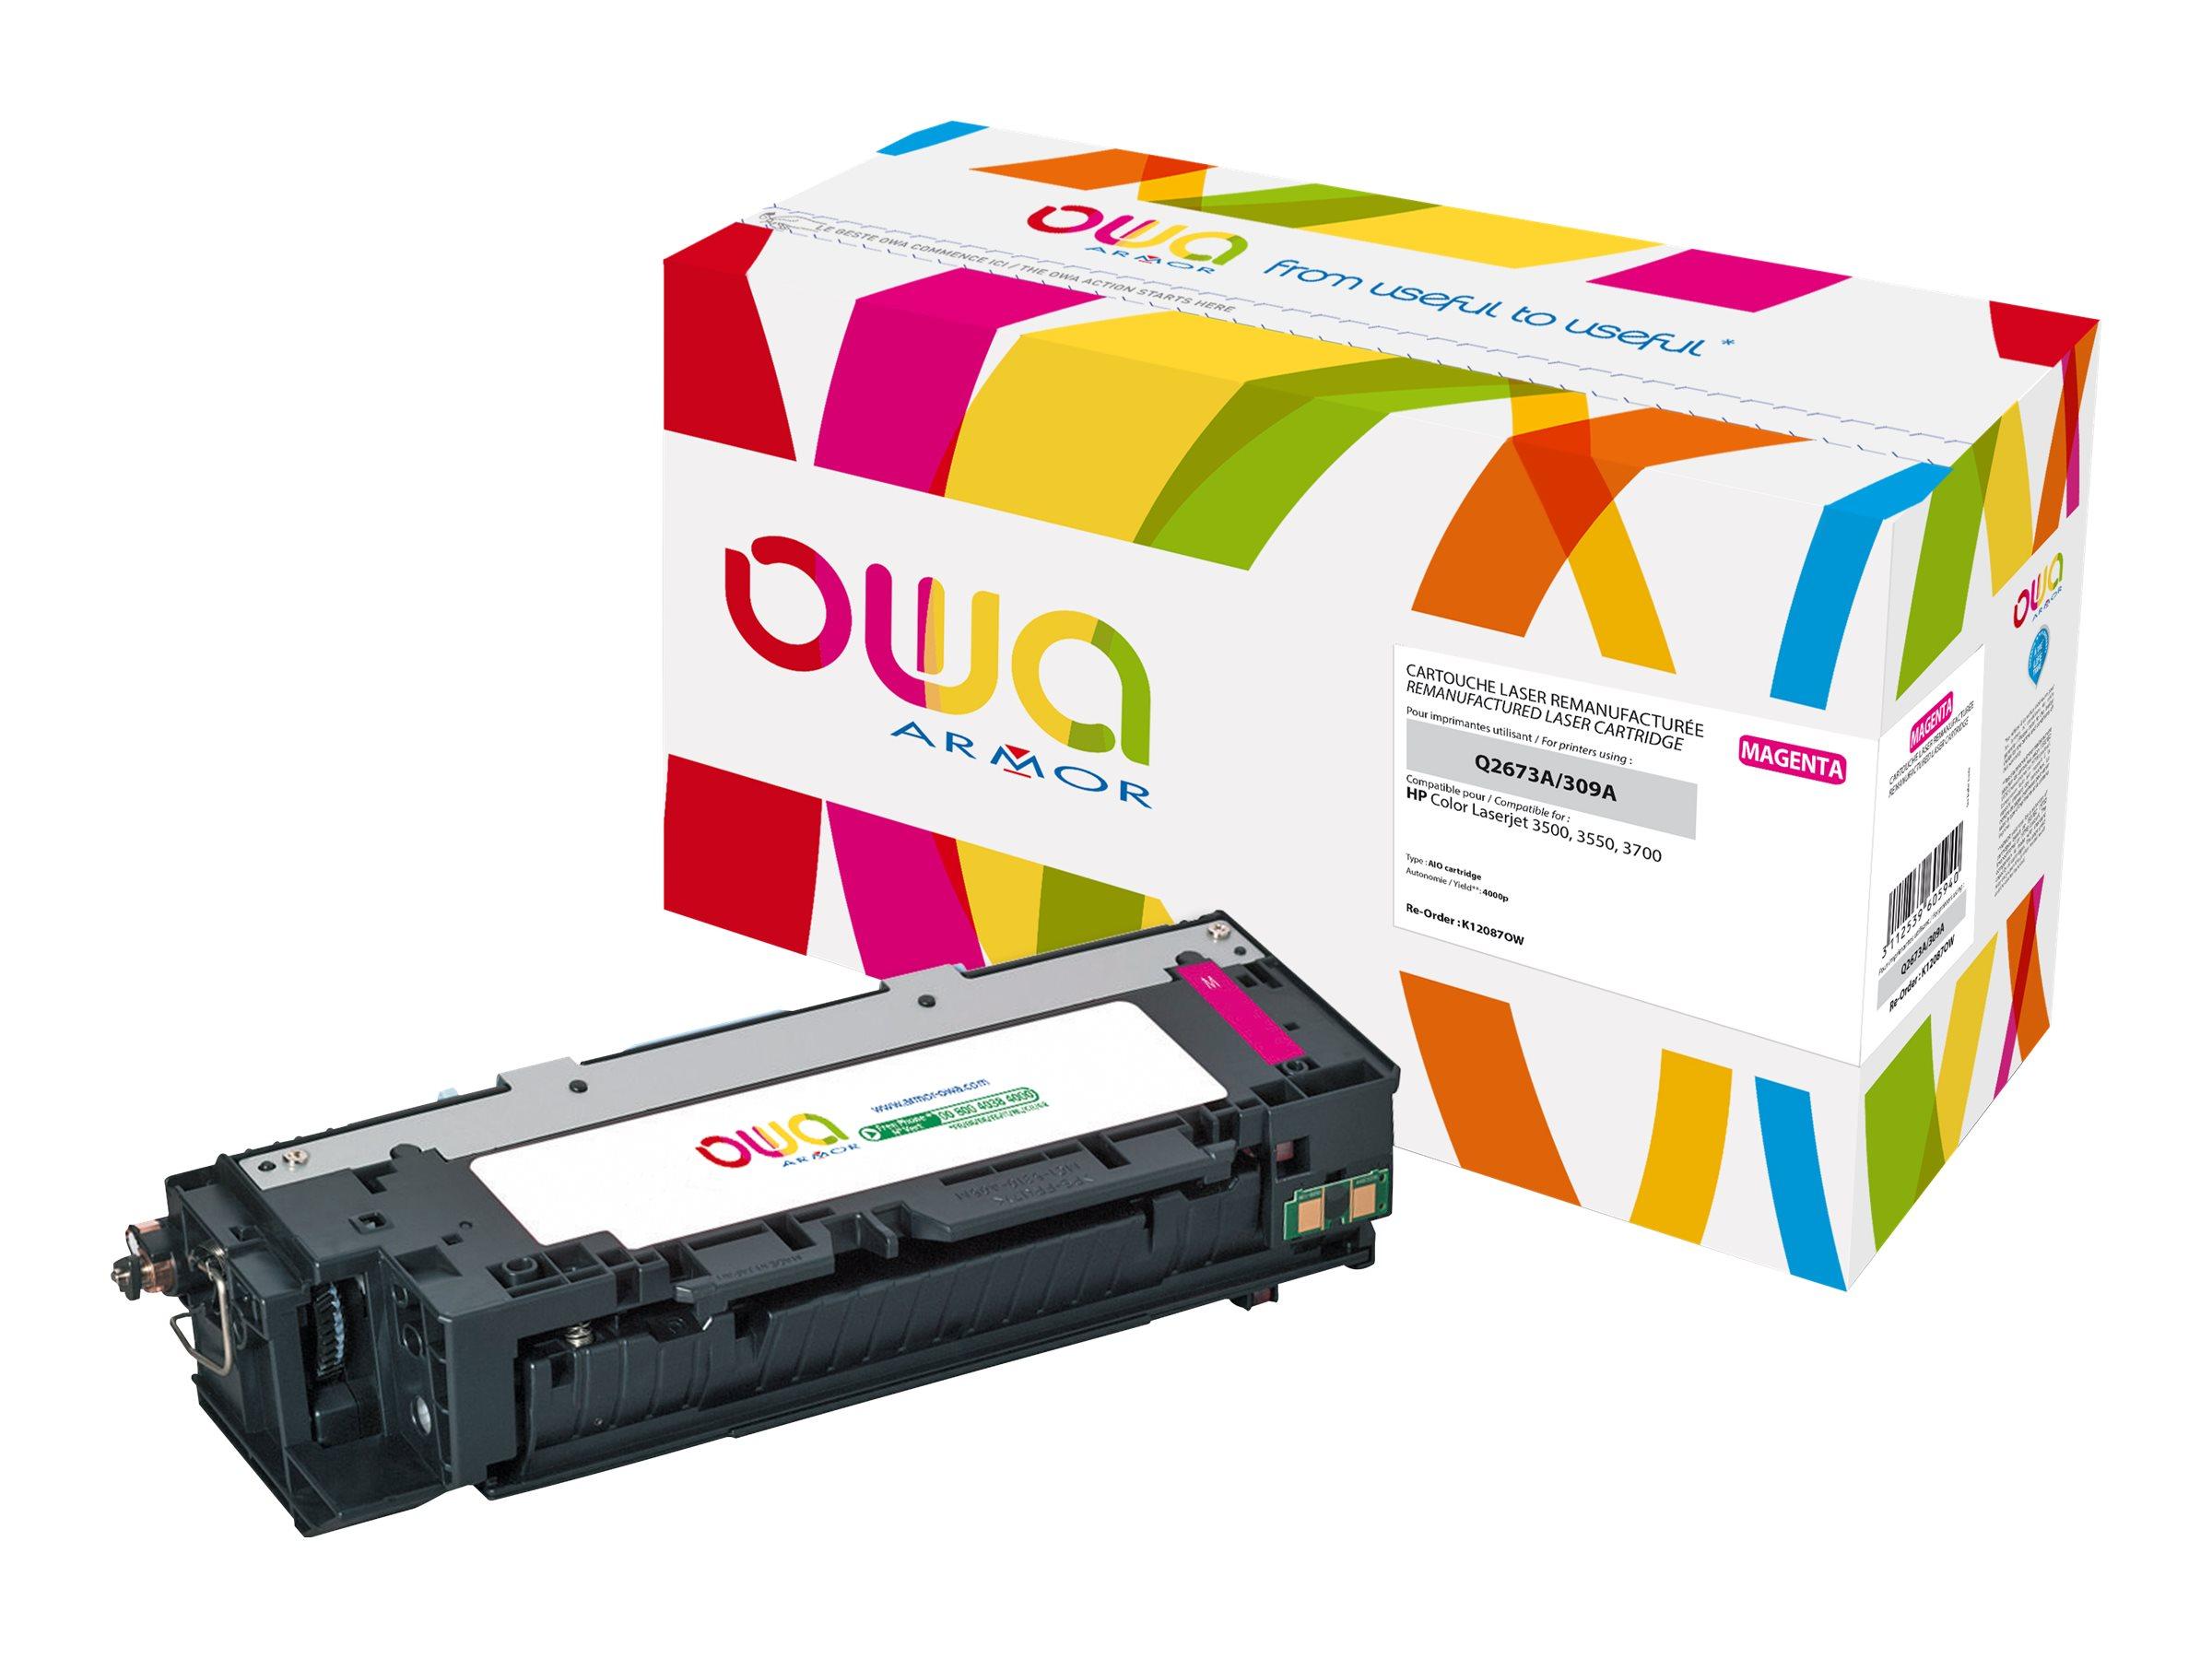 HP 309A - remanufacturé OWA K12087OW - Magenta - cartouche laser